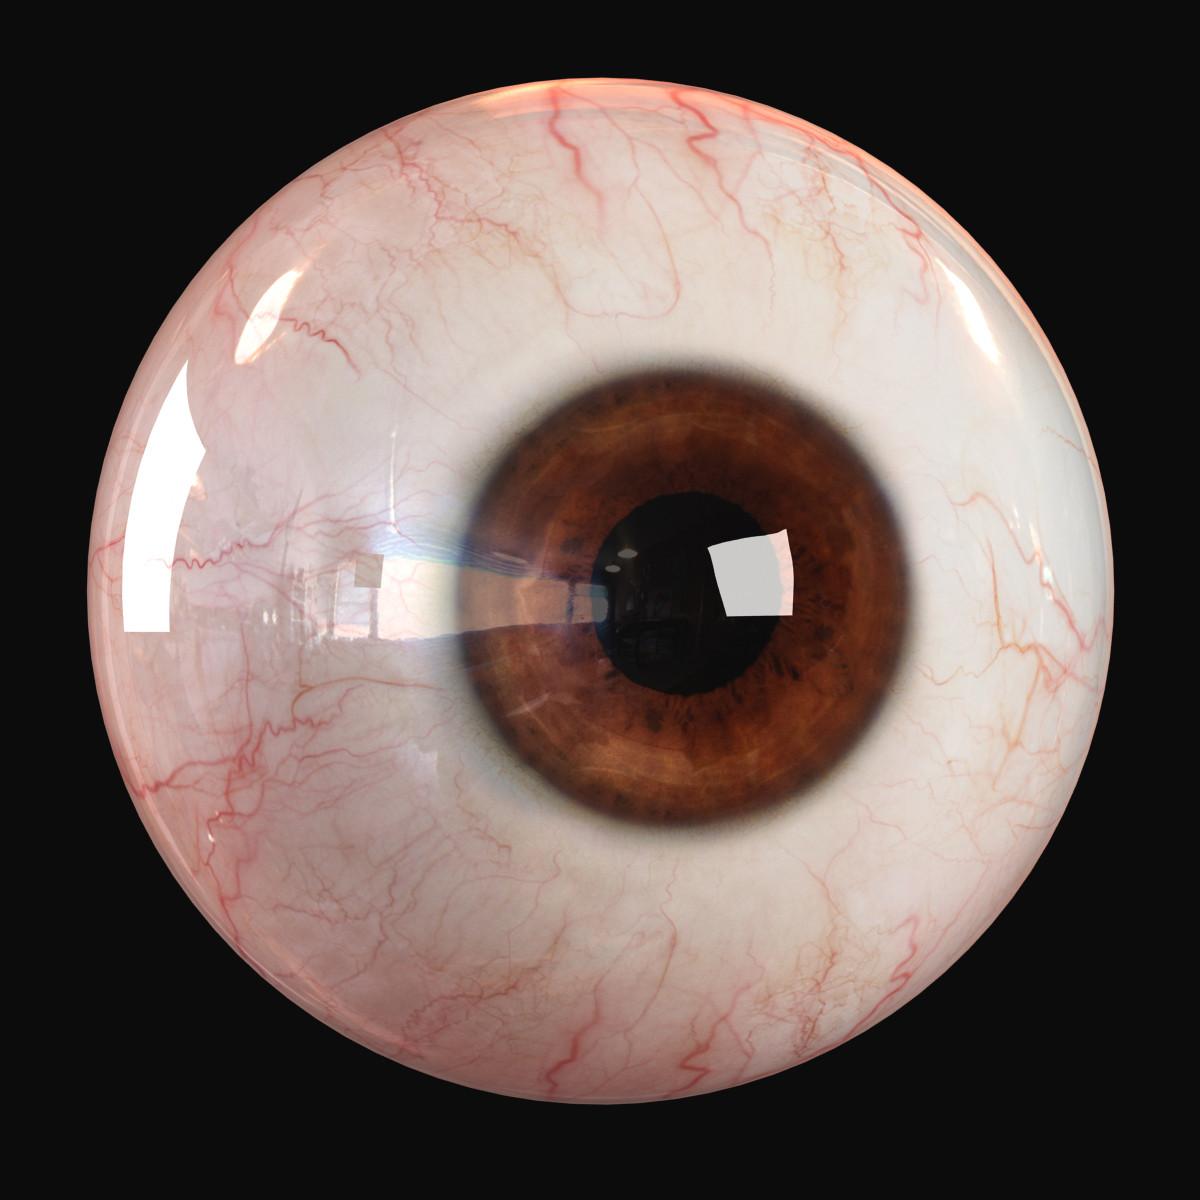 eye_image_01.jpg